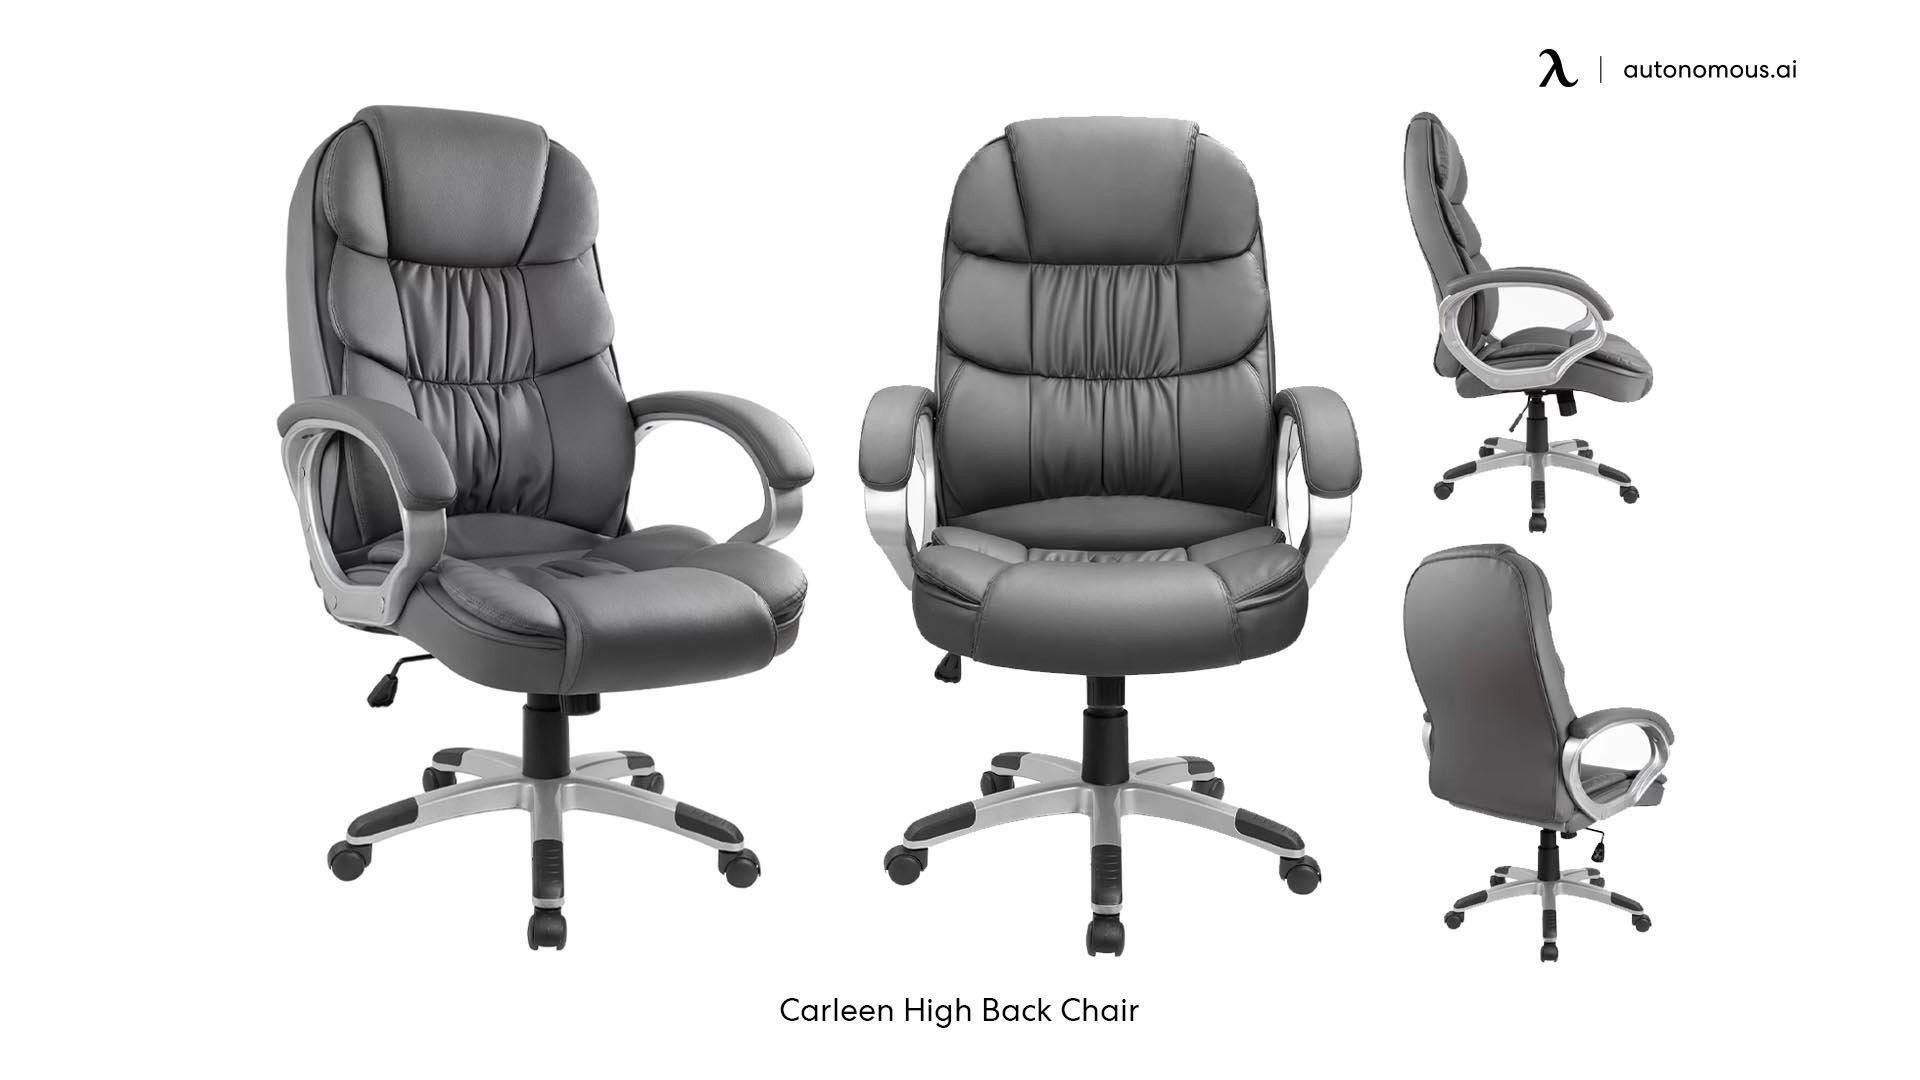 Carleen High Back Chair